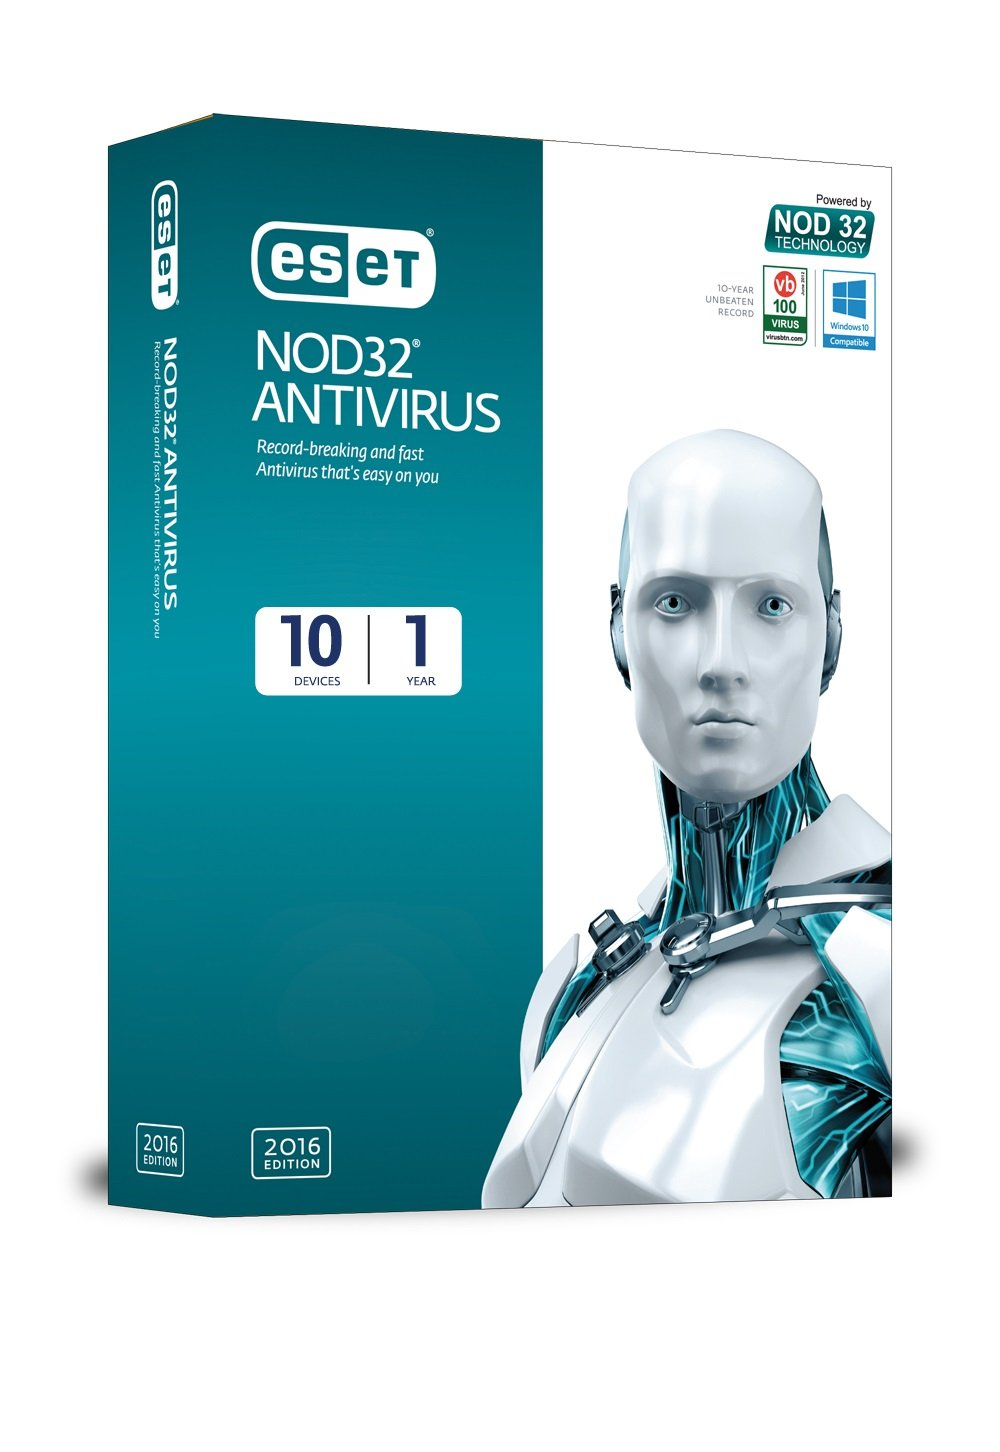 eset nod32 antivirus 10 license key trial